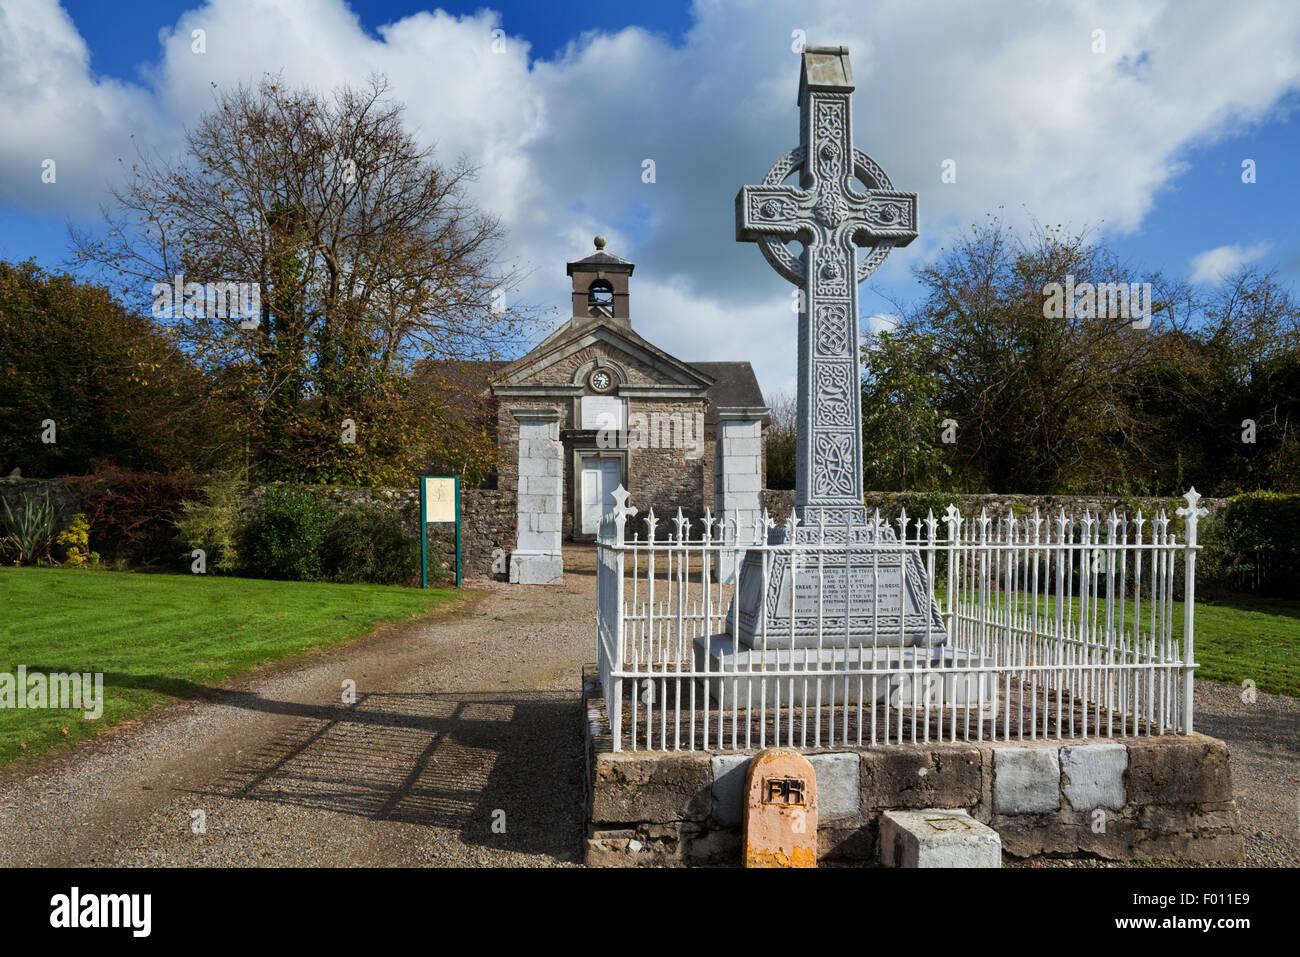 Memorial Cross to Lord Stuart de Decies, Villierstown Model Village established in 1740 as a linen weaving centre, - Stock Image